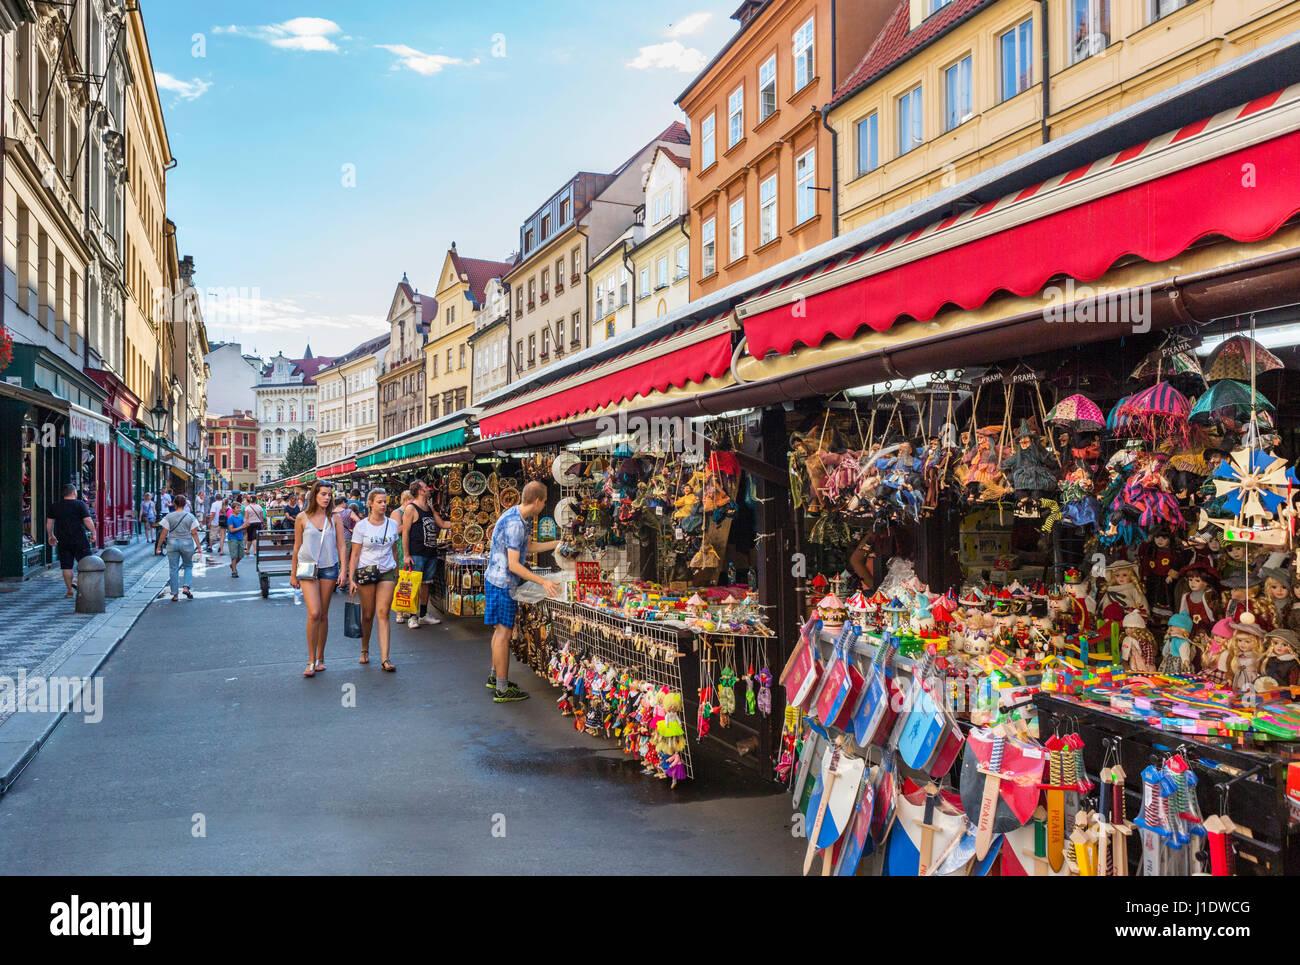 Havelska Market (Havelske trziste), Prague, Czech Republic - Stock Image